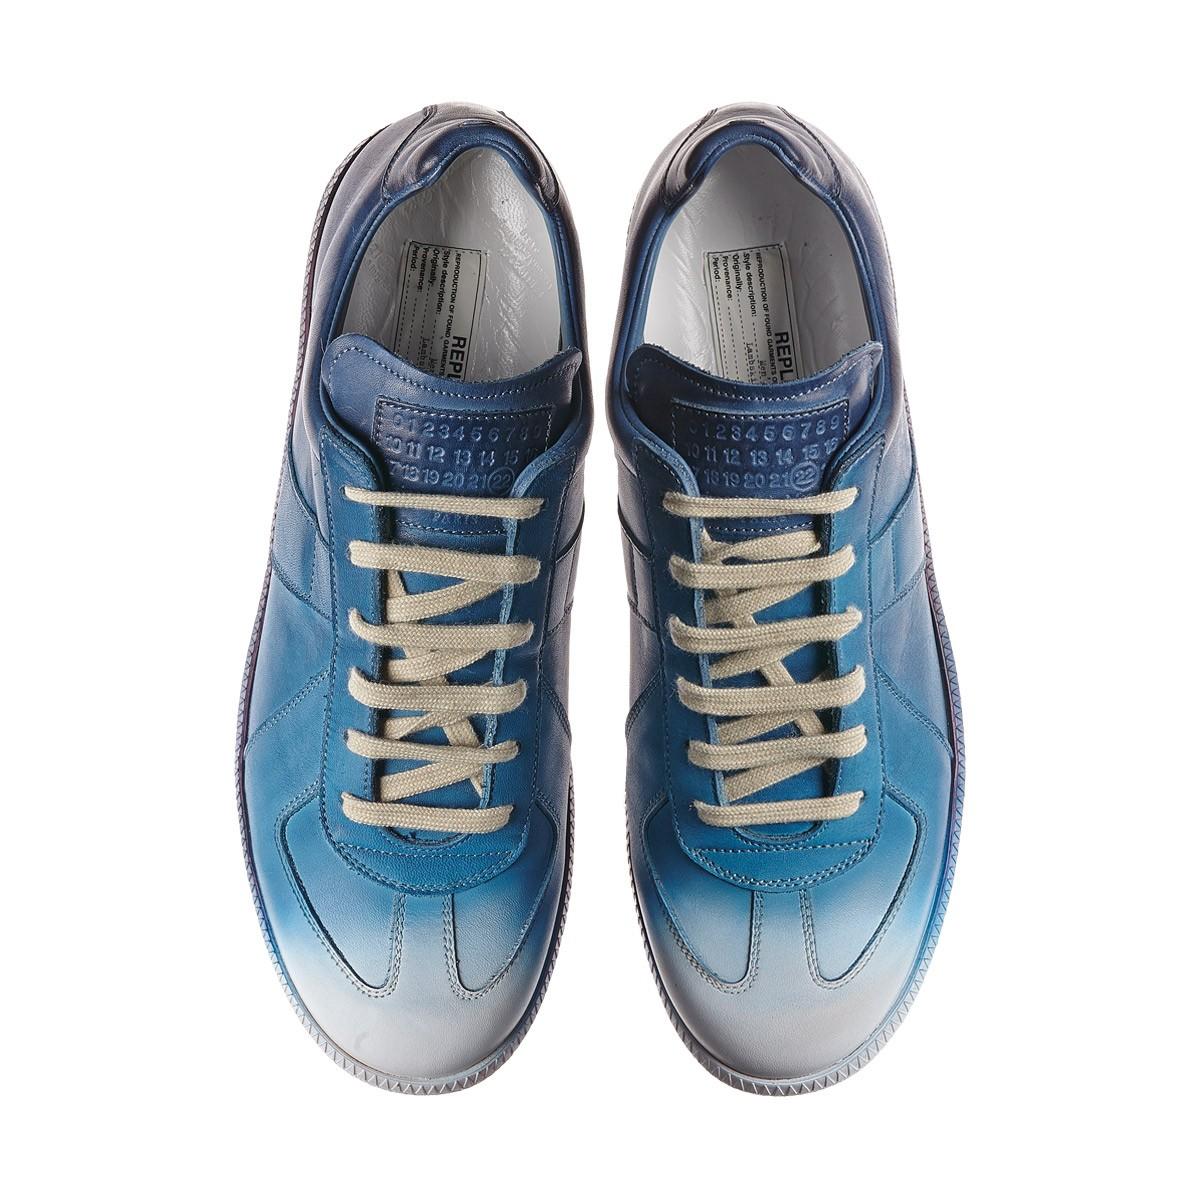 replica-sneaker-airbrush2